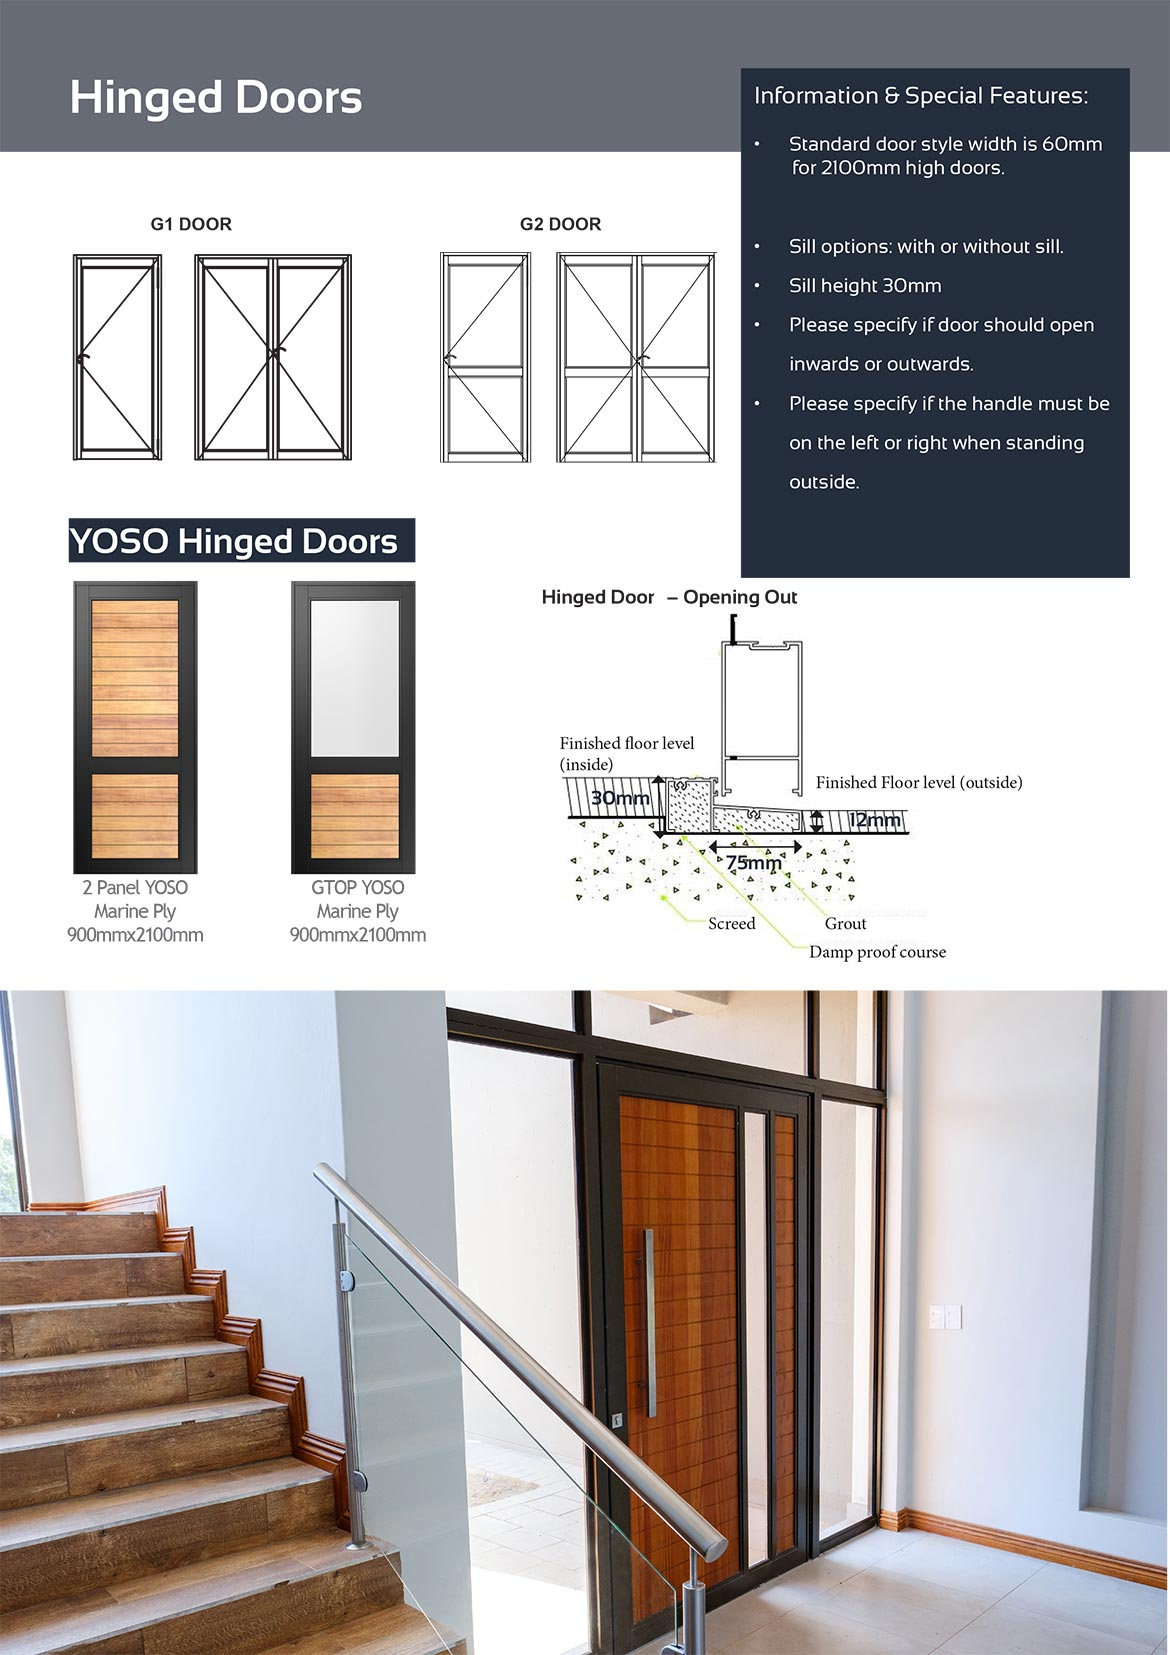 vanacht aluminium hinged doors matrix and information 2018